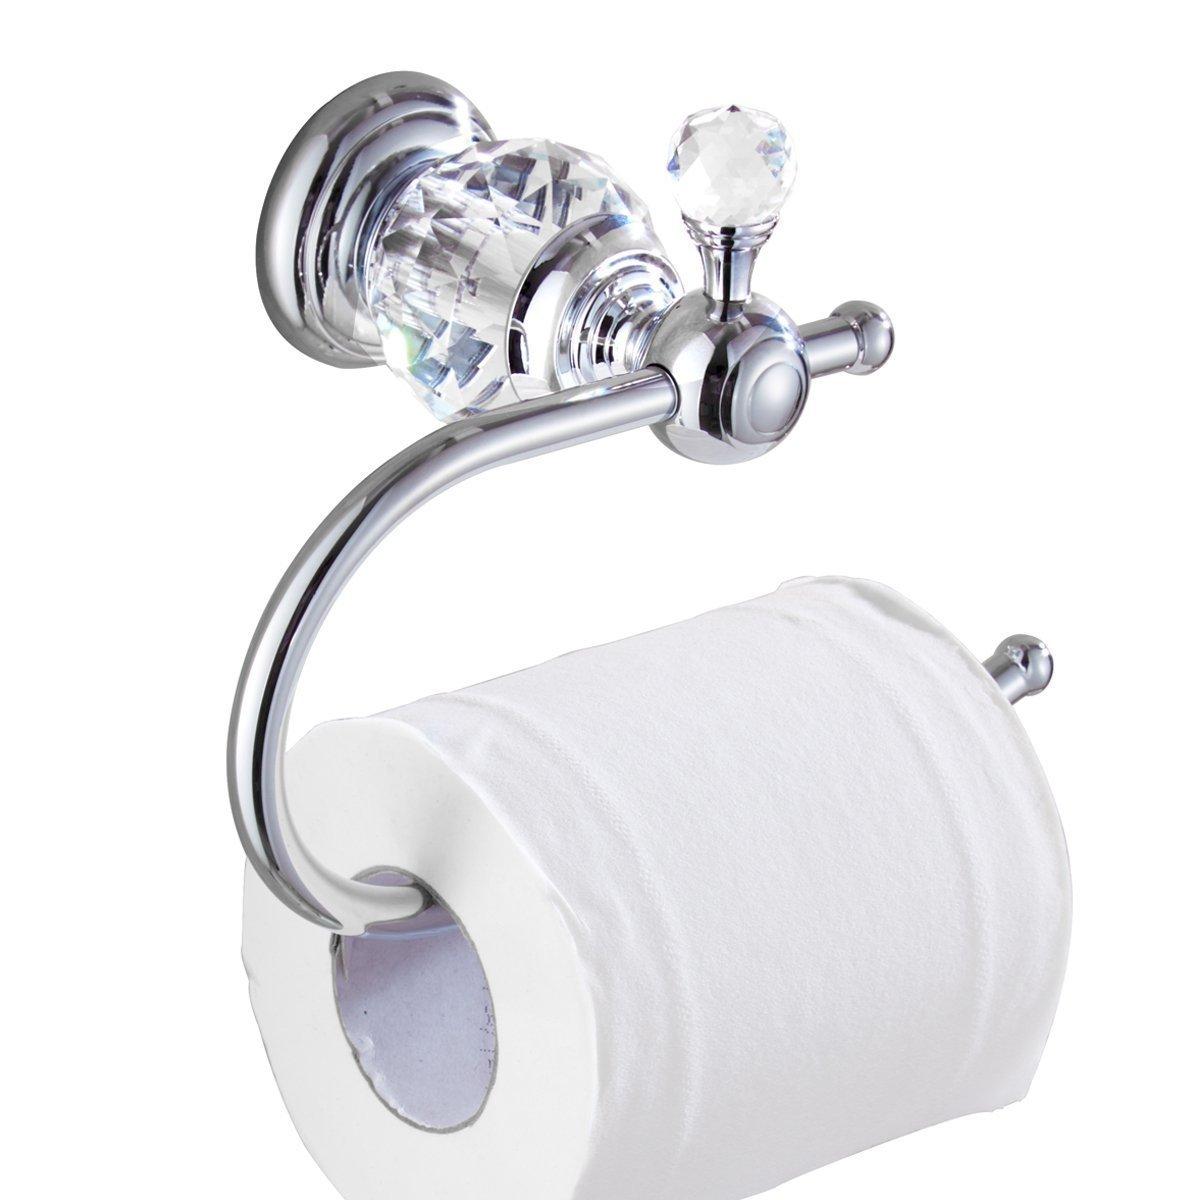 Kabter Crystal Series Brass Toilet Paper Roll Holder, Polished Chrome